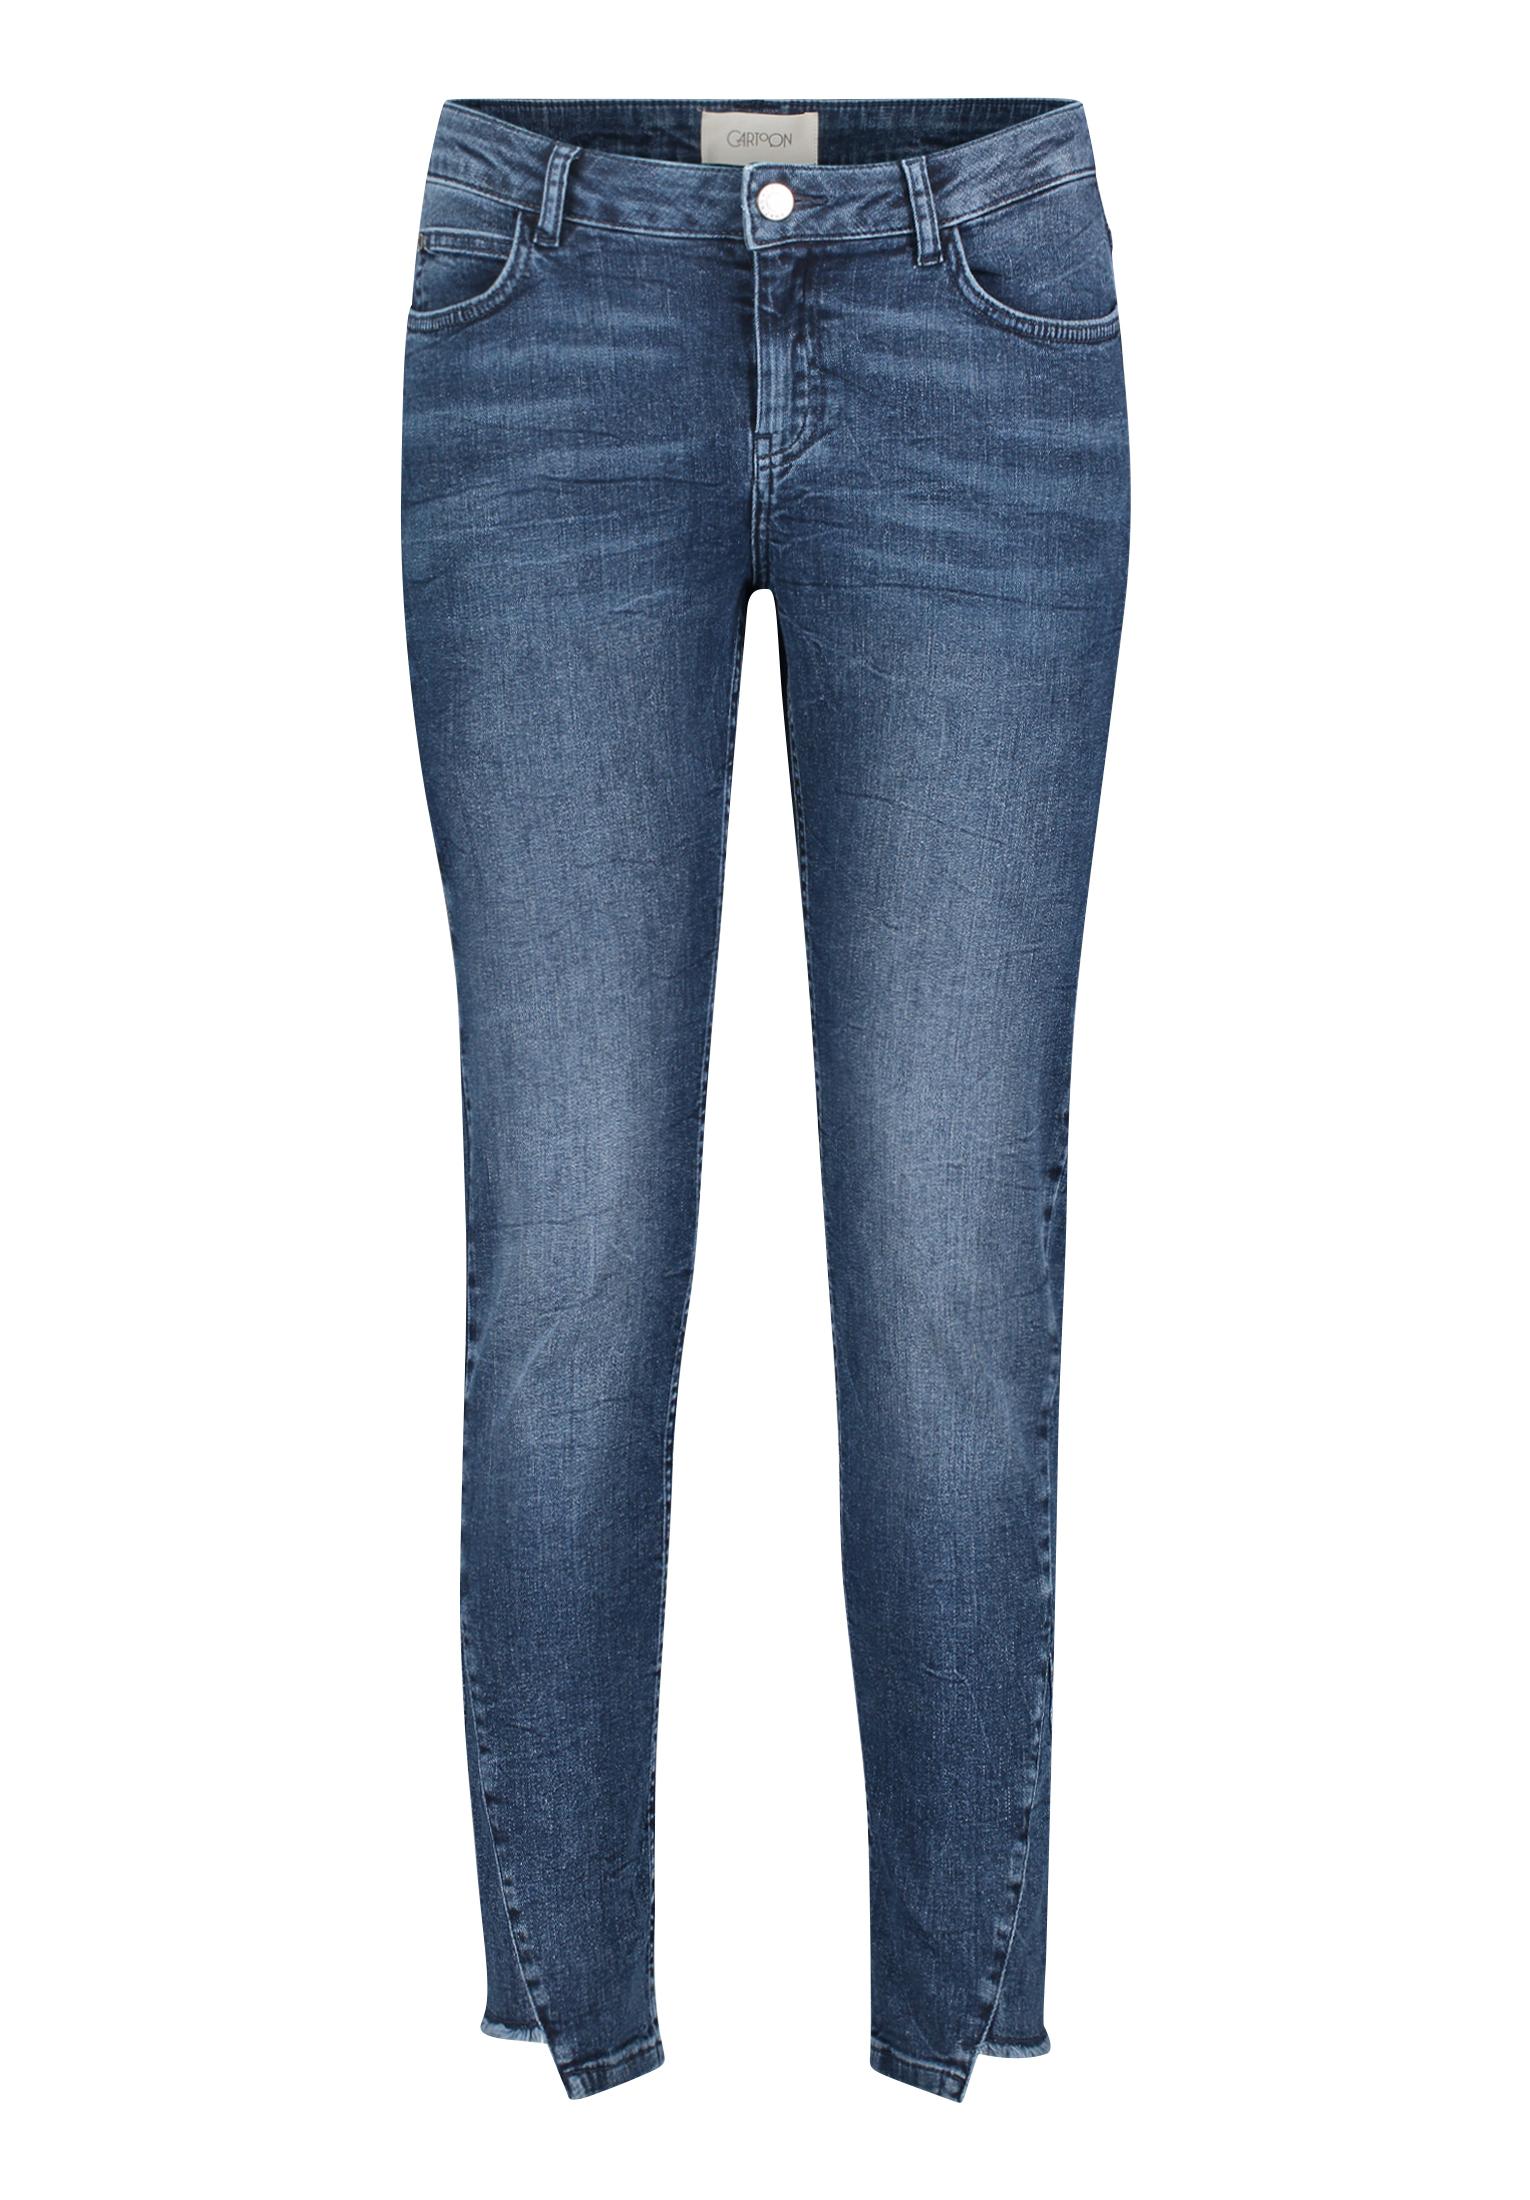 Cartoon Modern fit jeans